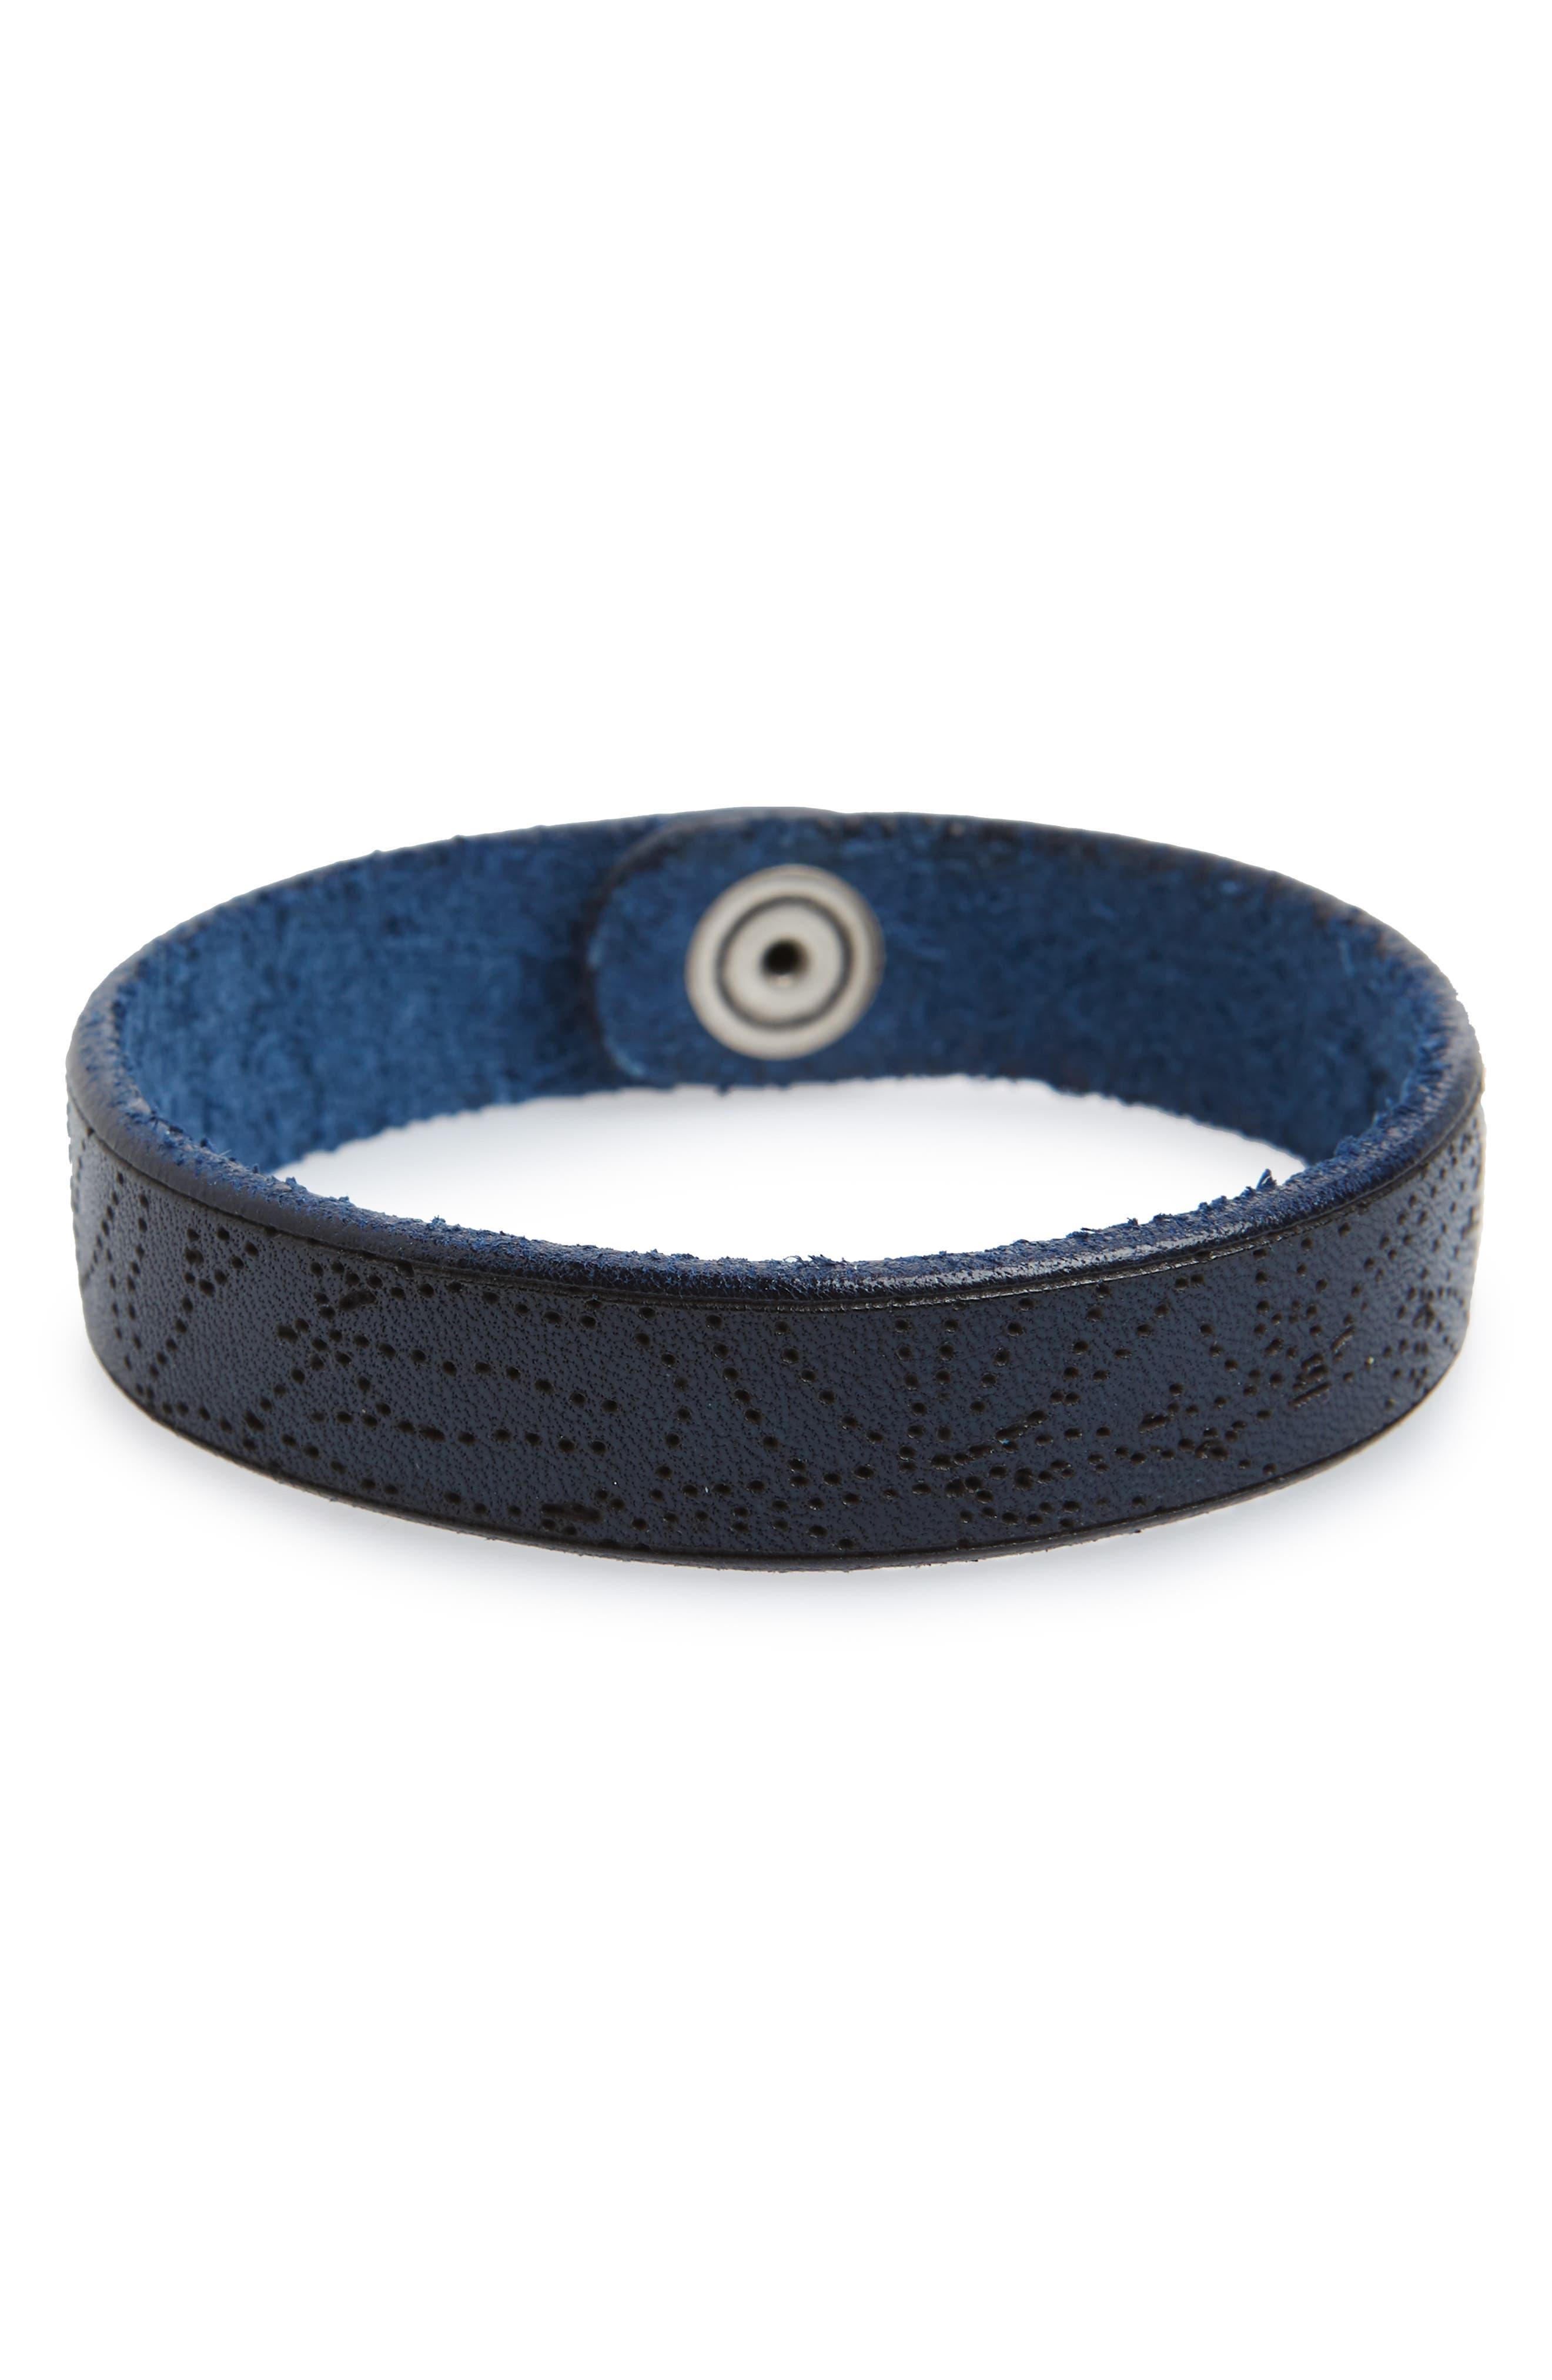 Main Image - Orciani Stain Leather Bracelet